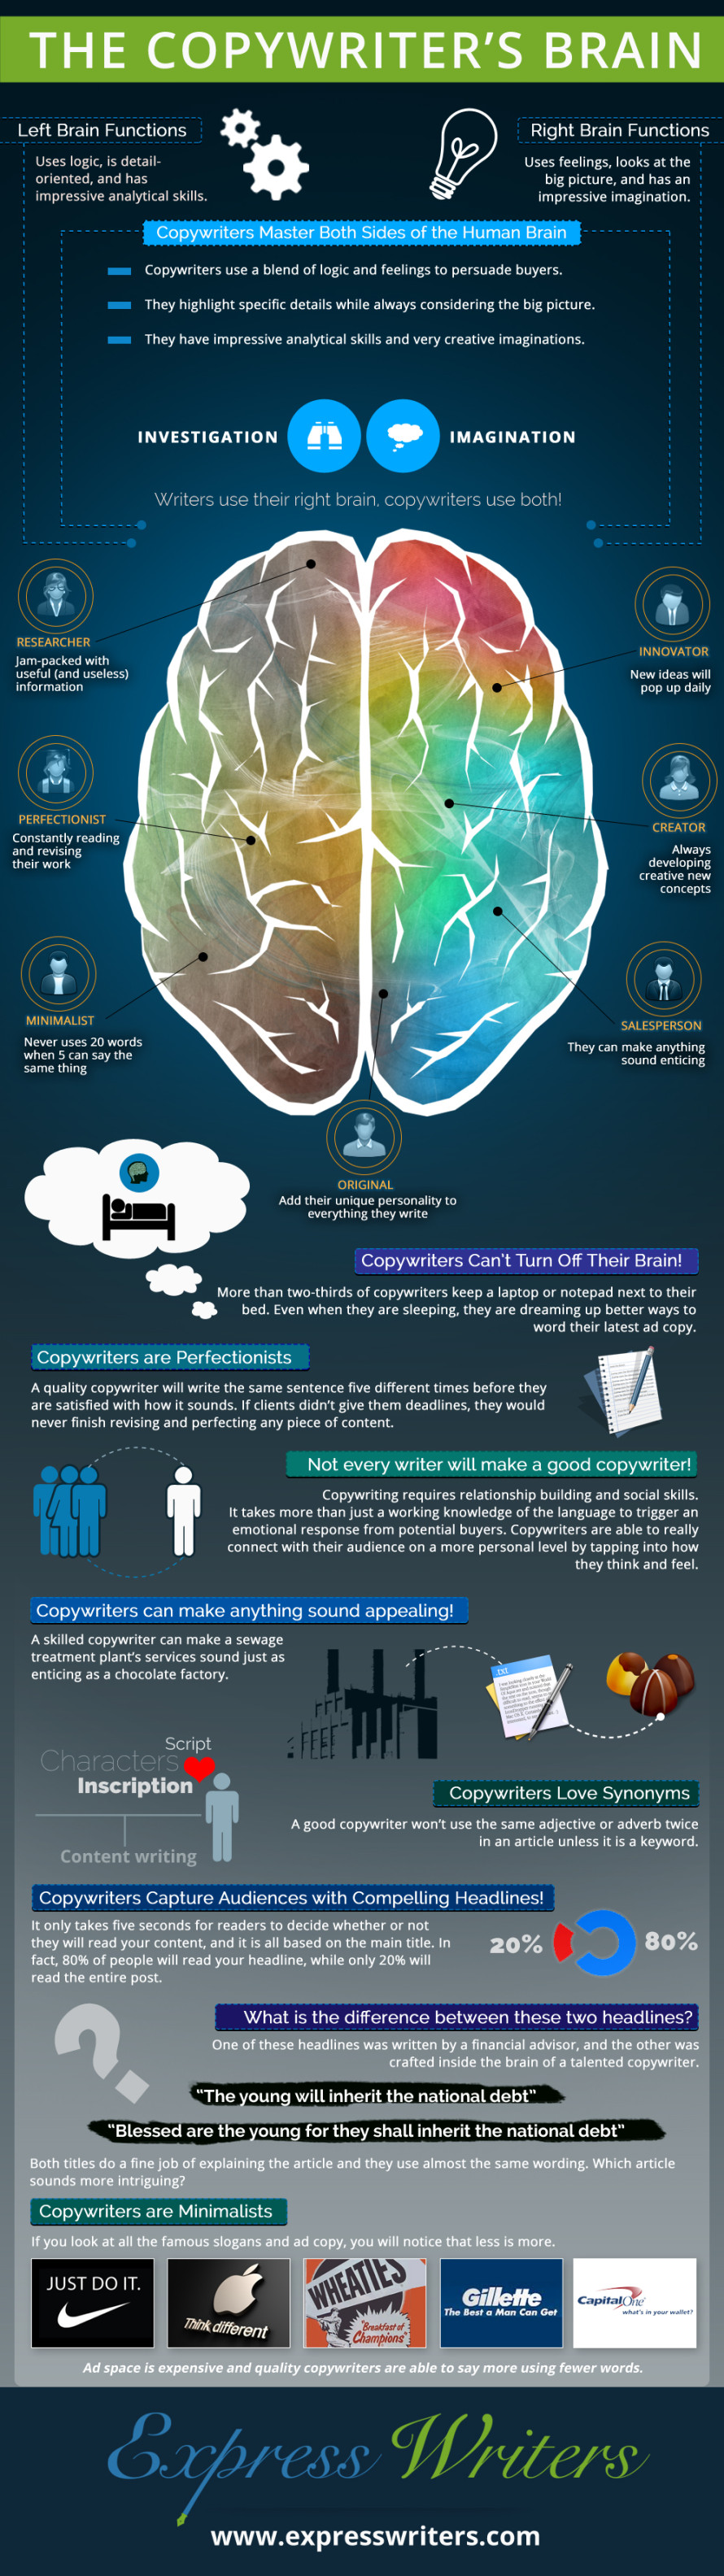 the-copywriters-brain_525f98fcaa47f